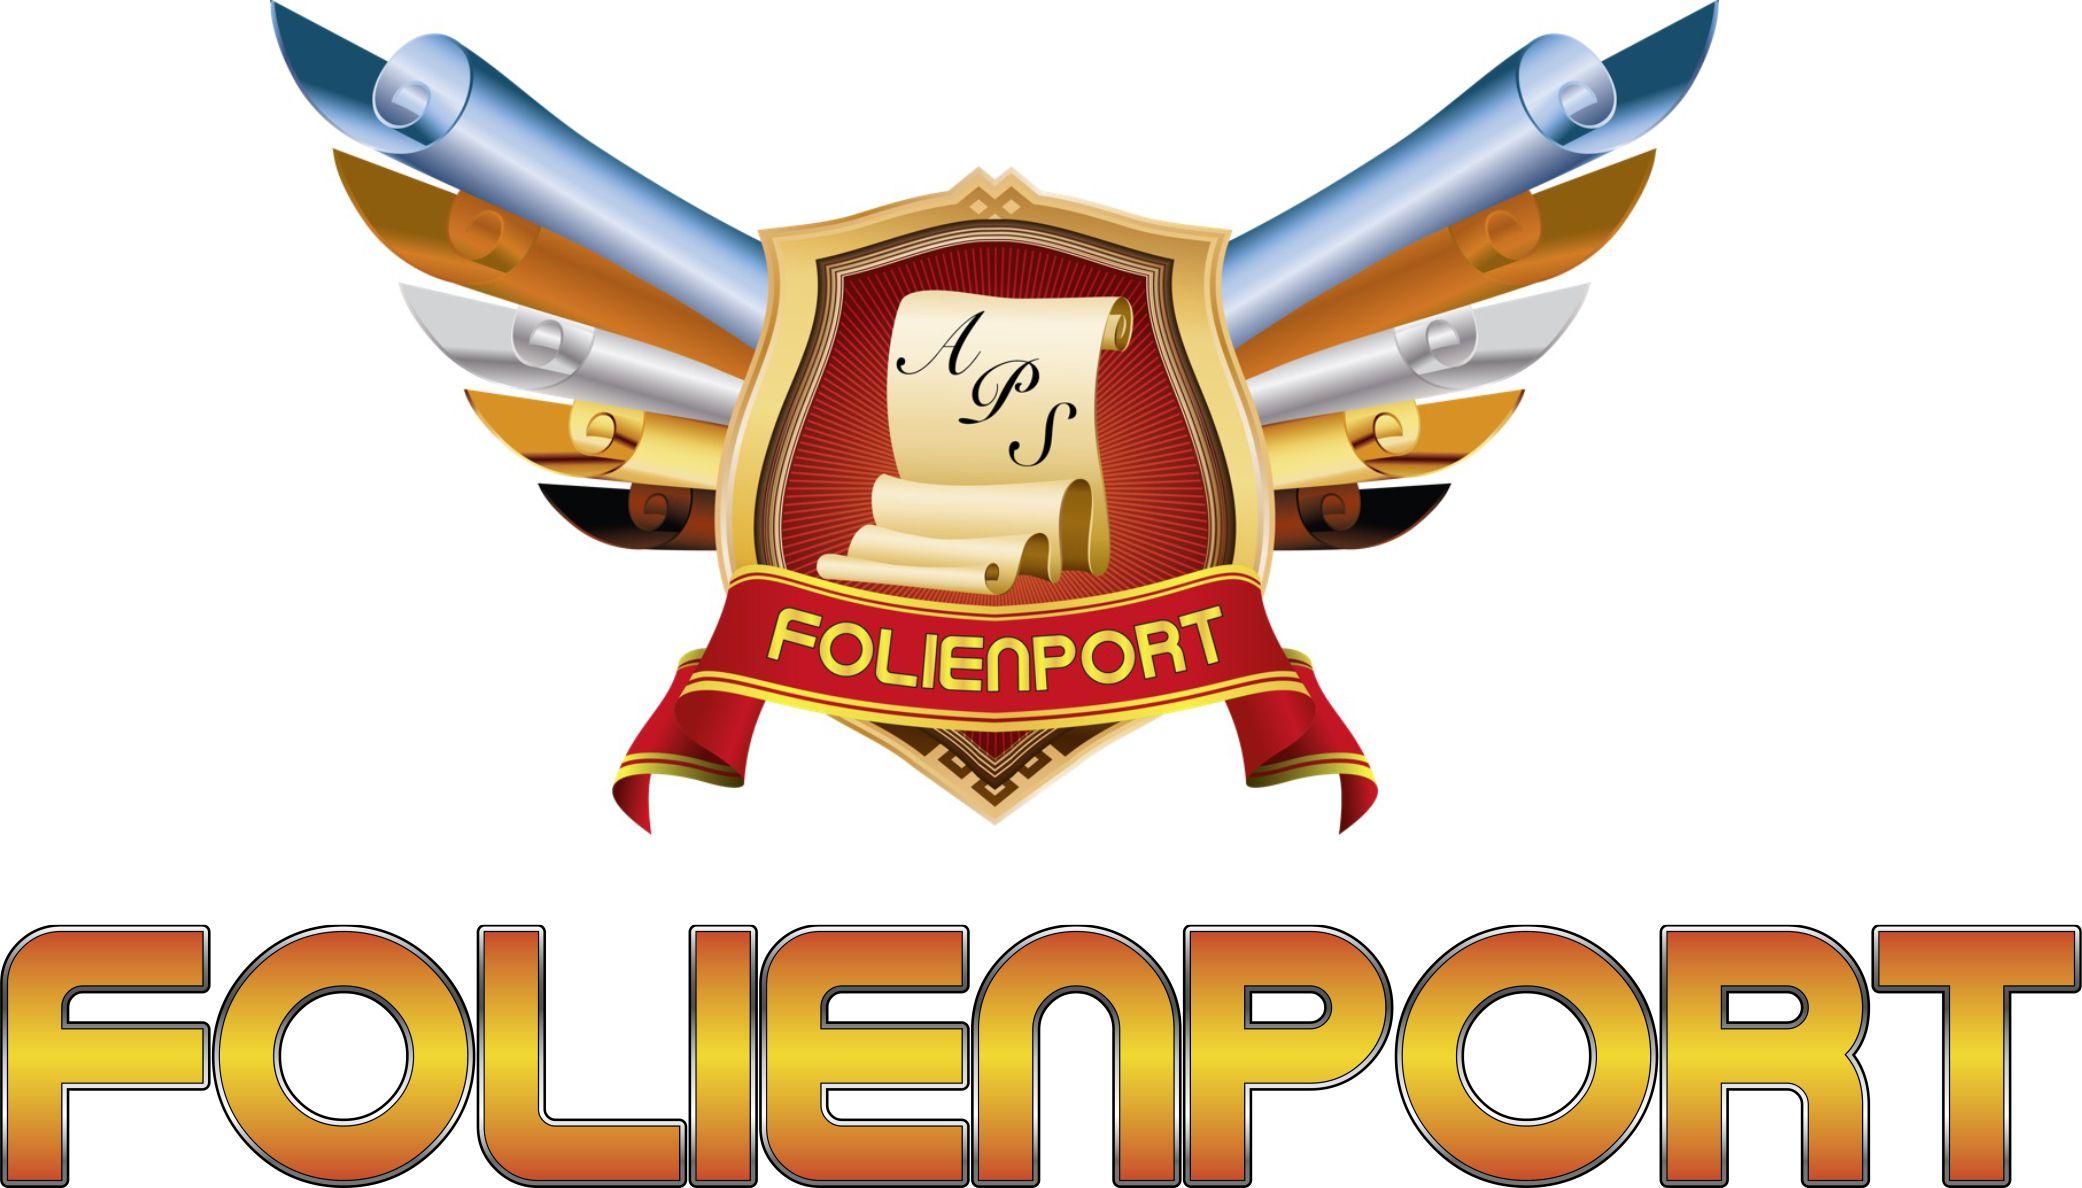 Folienport